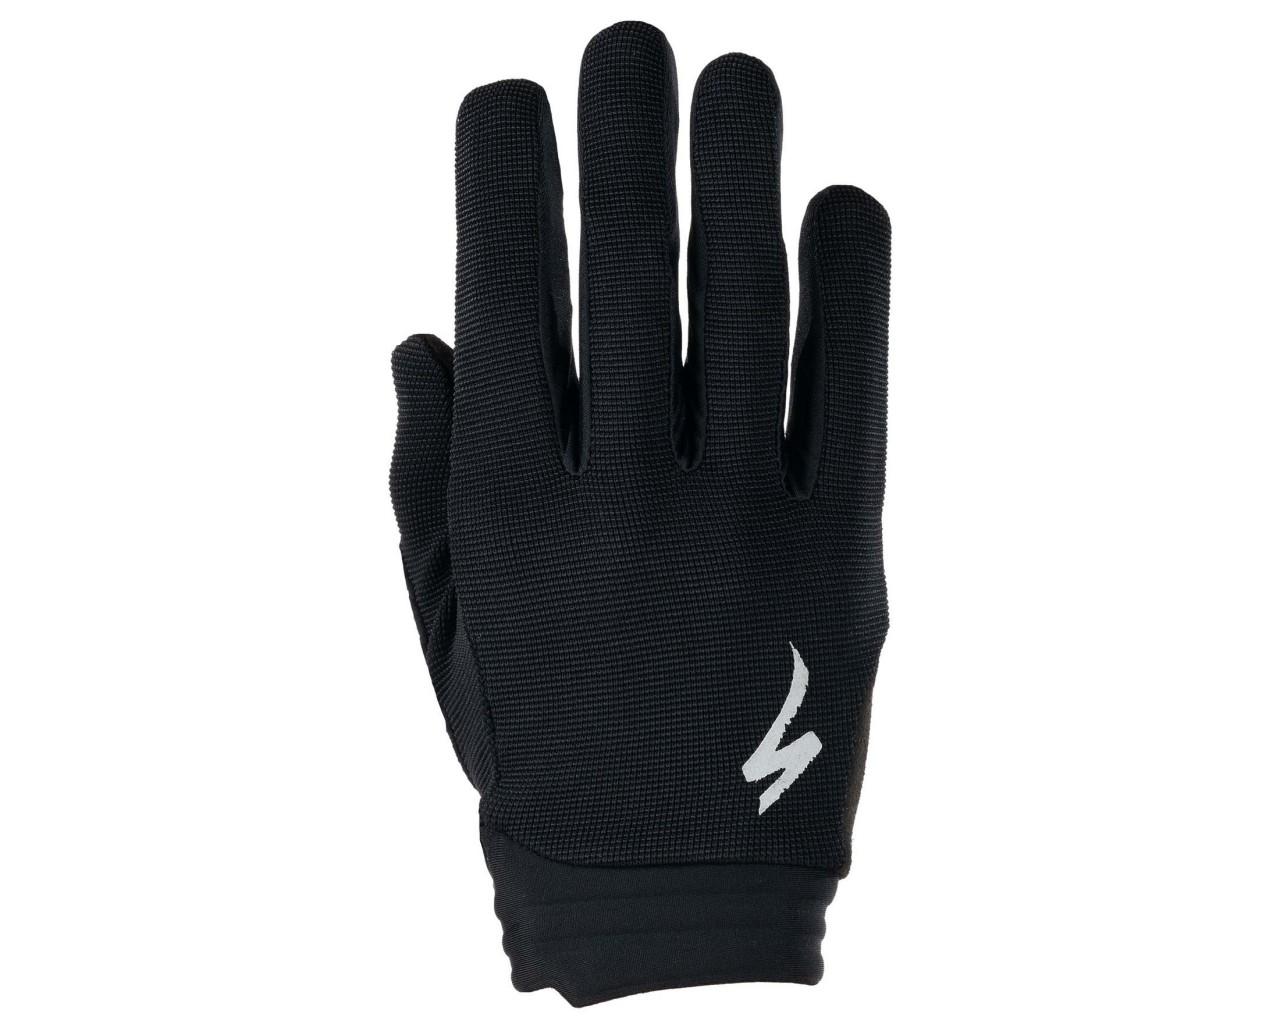 Specialized Trail Handschuhe langfinger   black